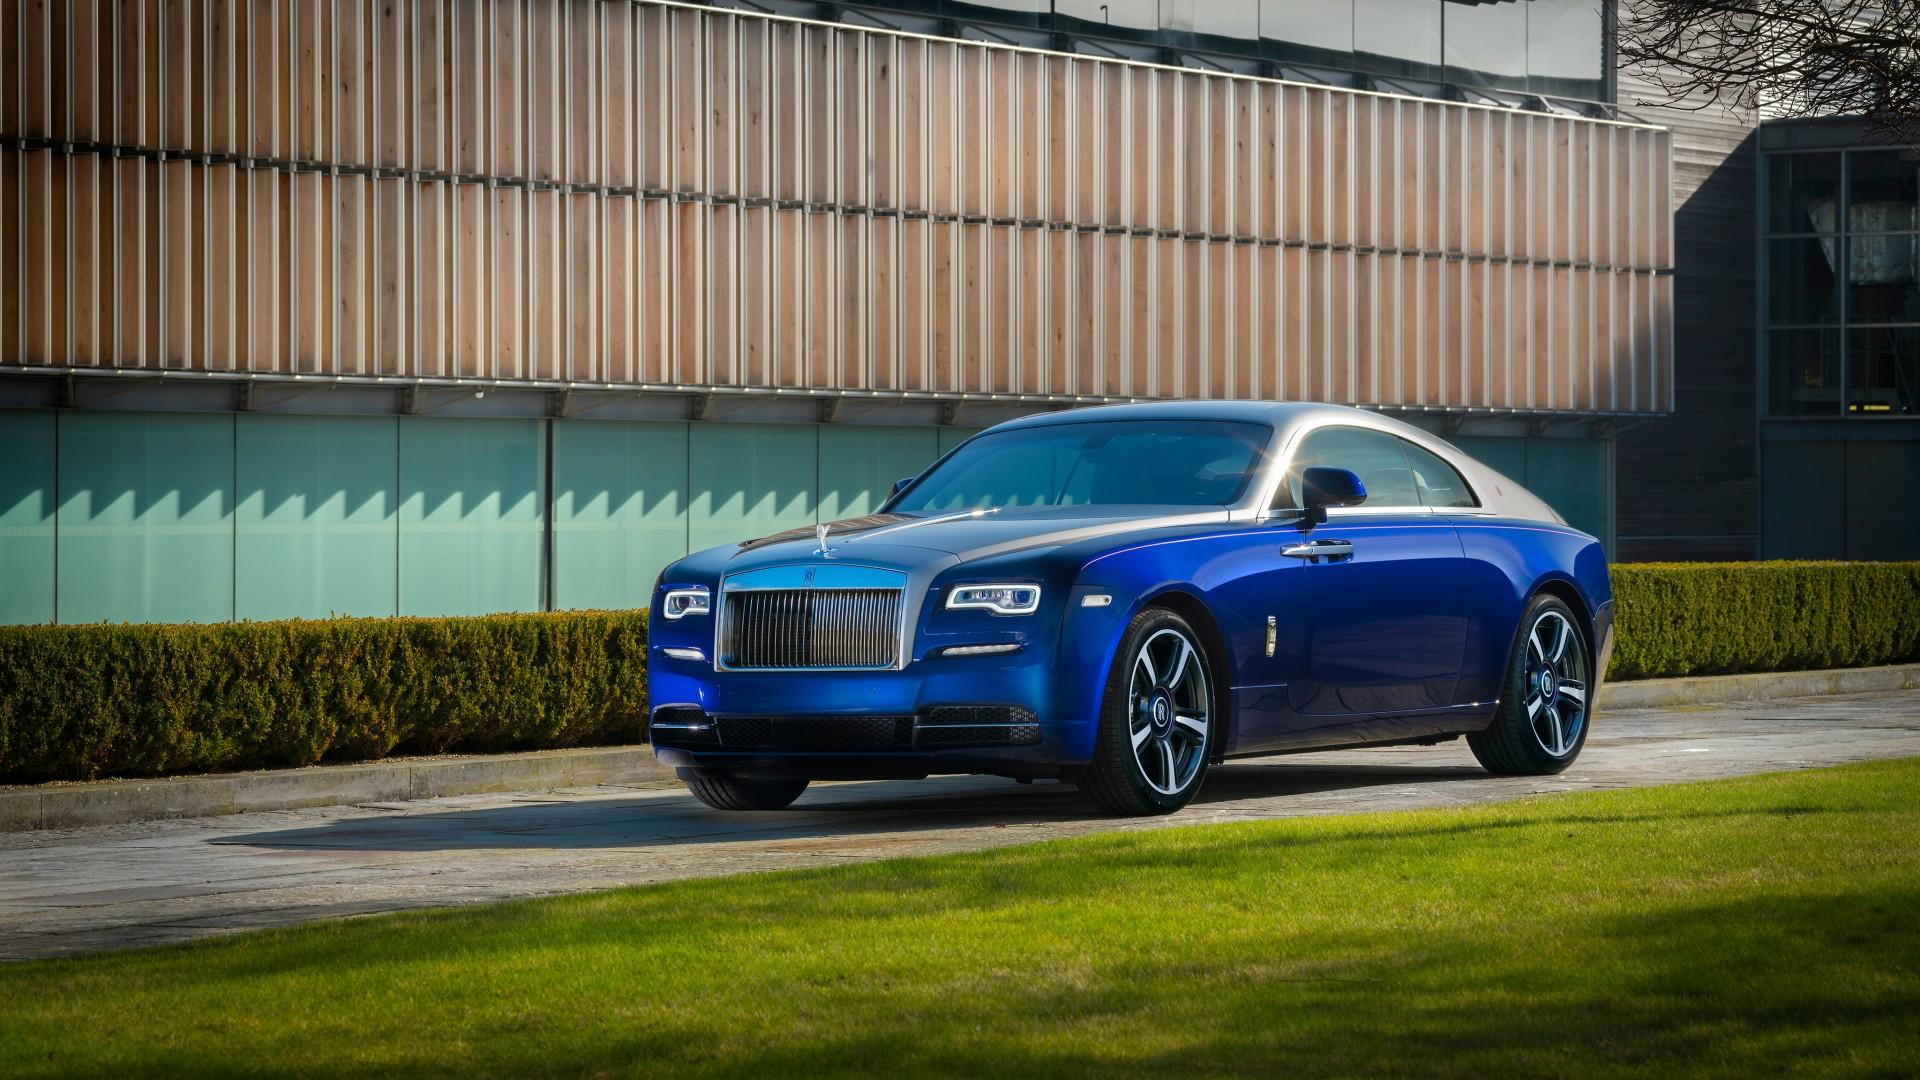 Phantom Car Wallpaper Rolls Royce Wraith 2017 Bespoke 4k Wallpaper Hd Car